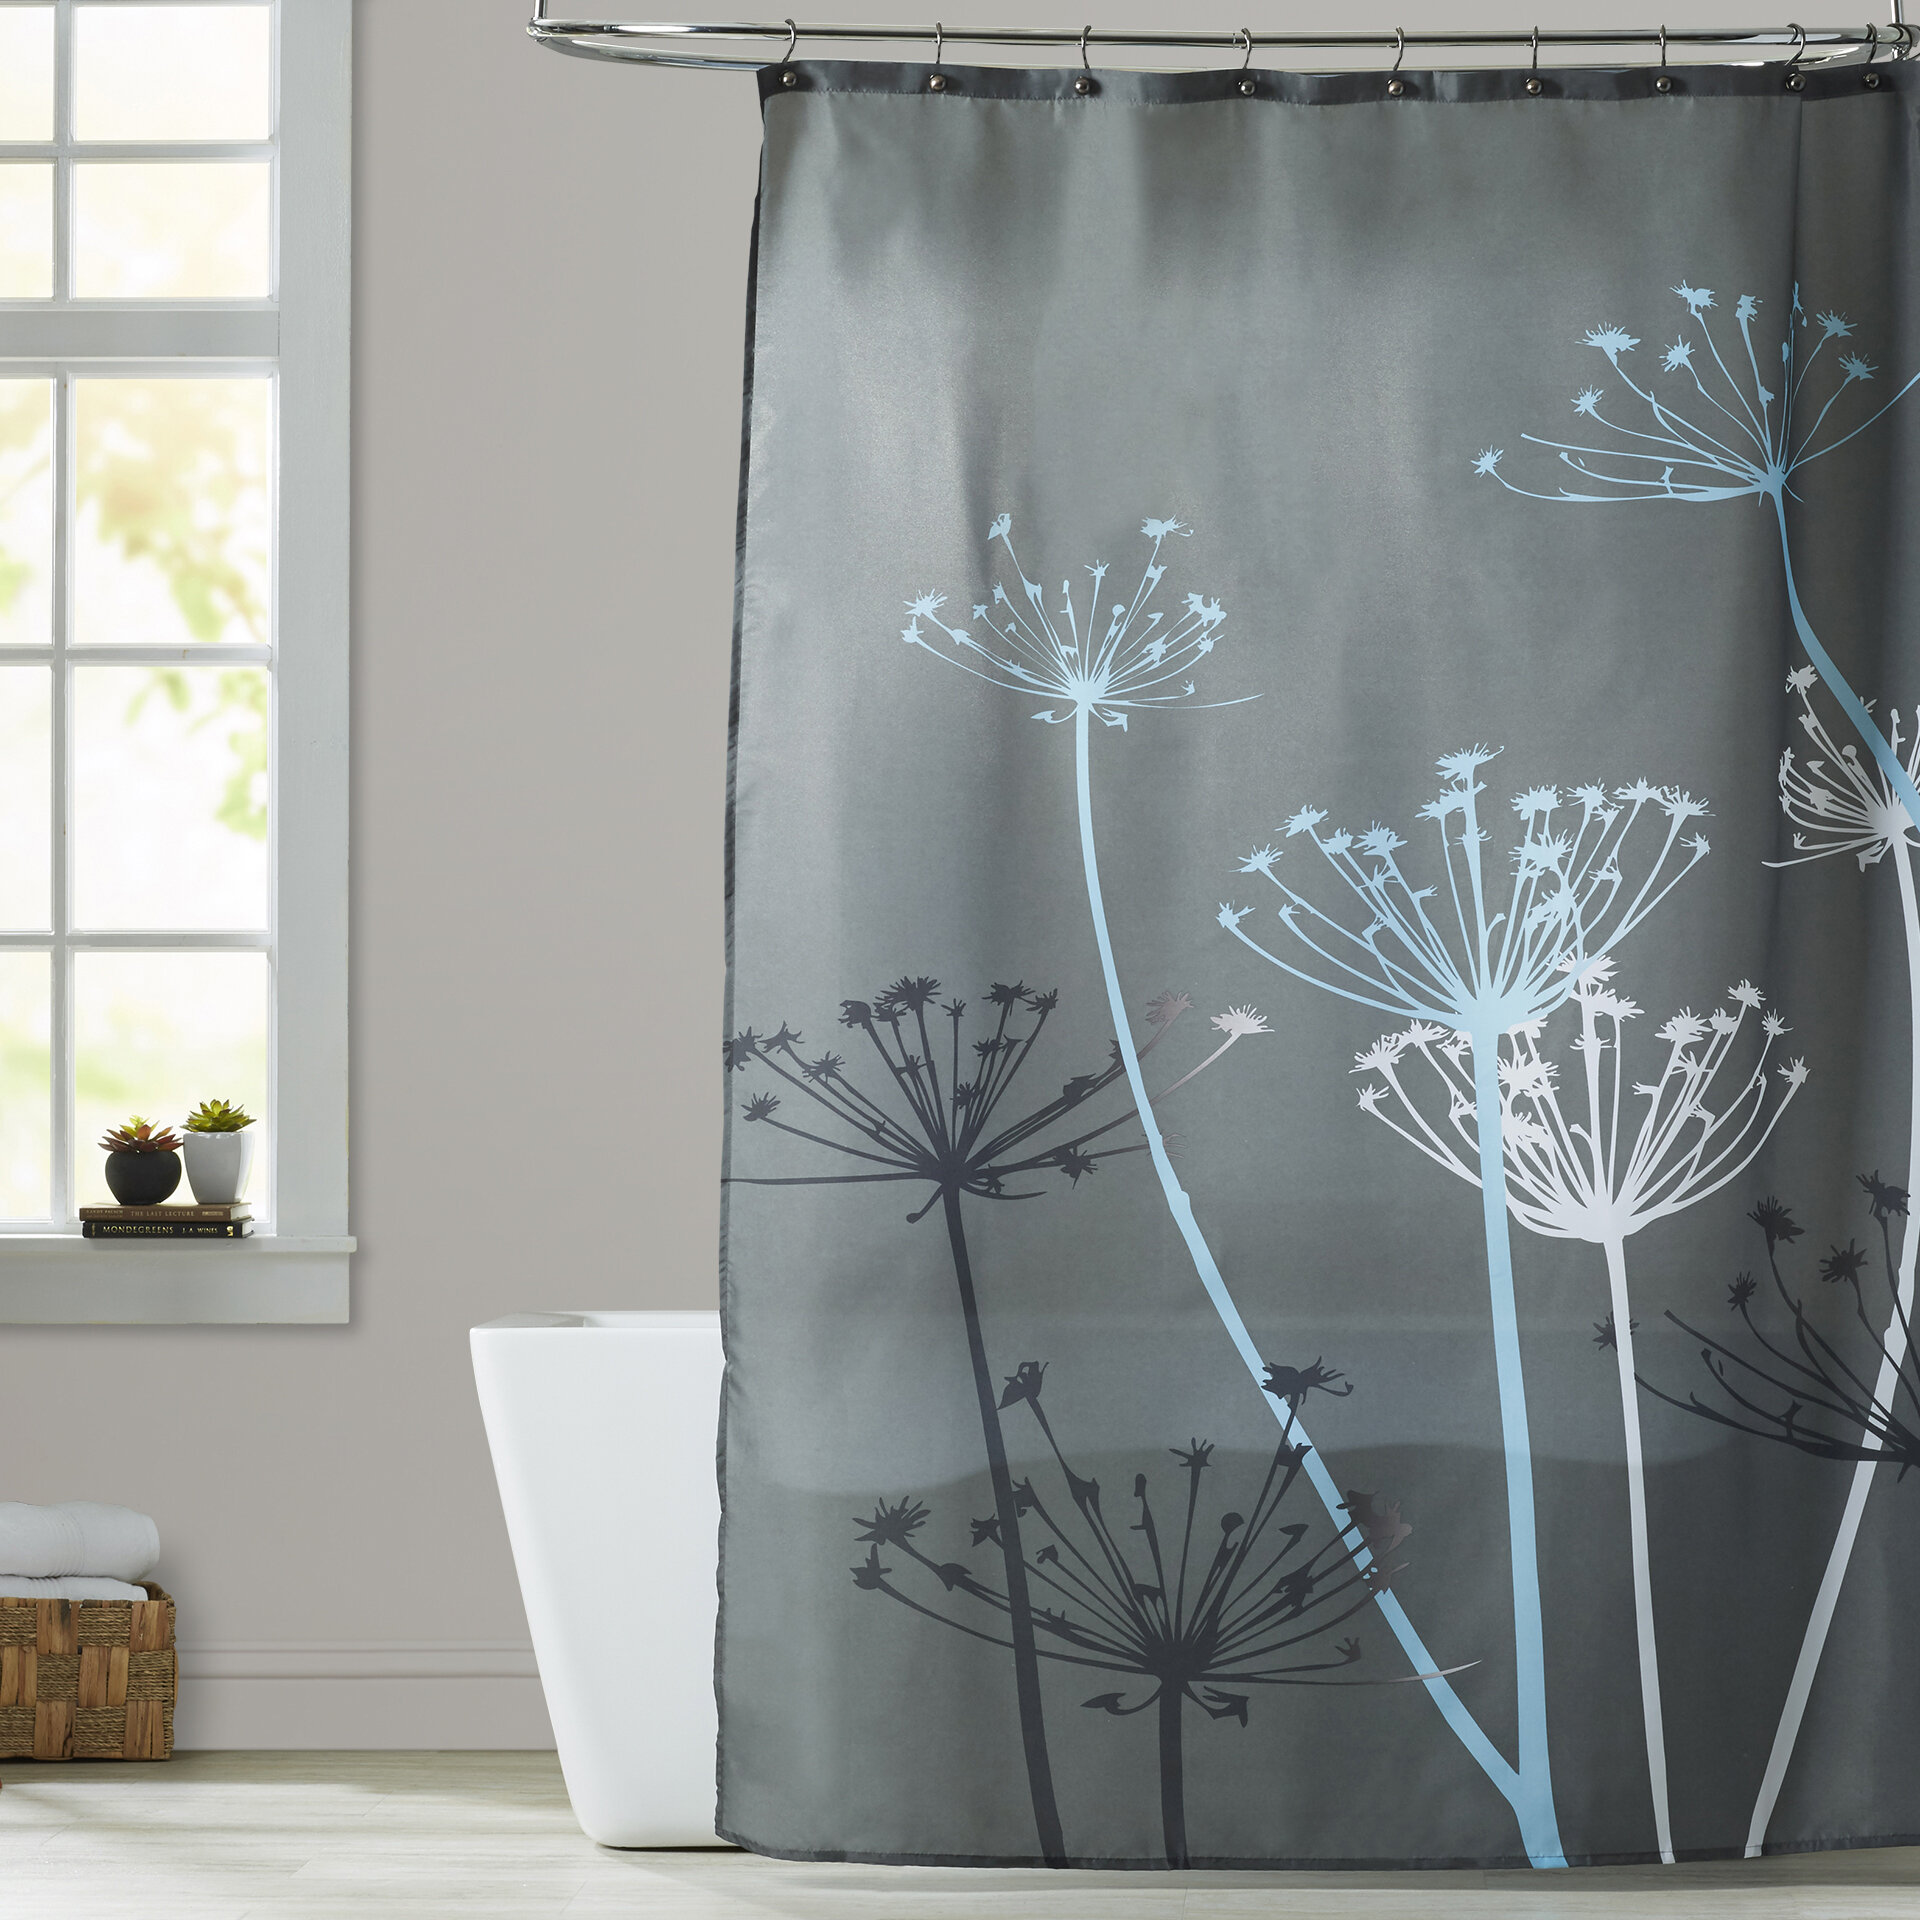 Ebern Designs Nardone Shower Curtain & Reviews | Wayfair